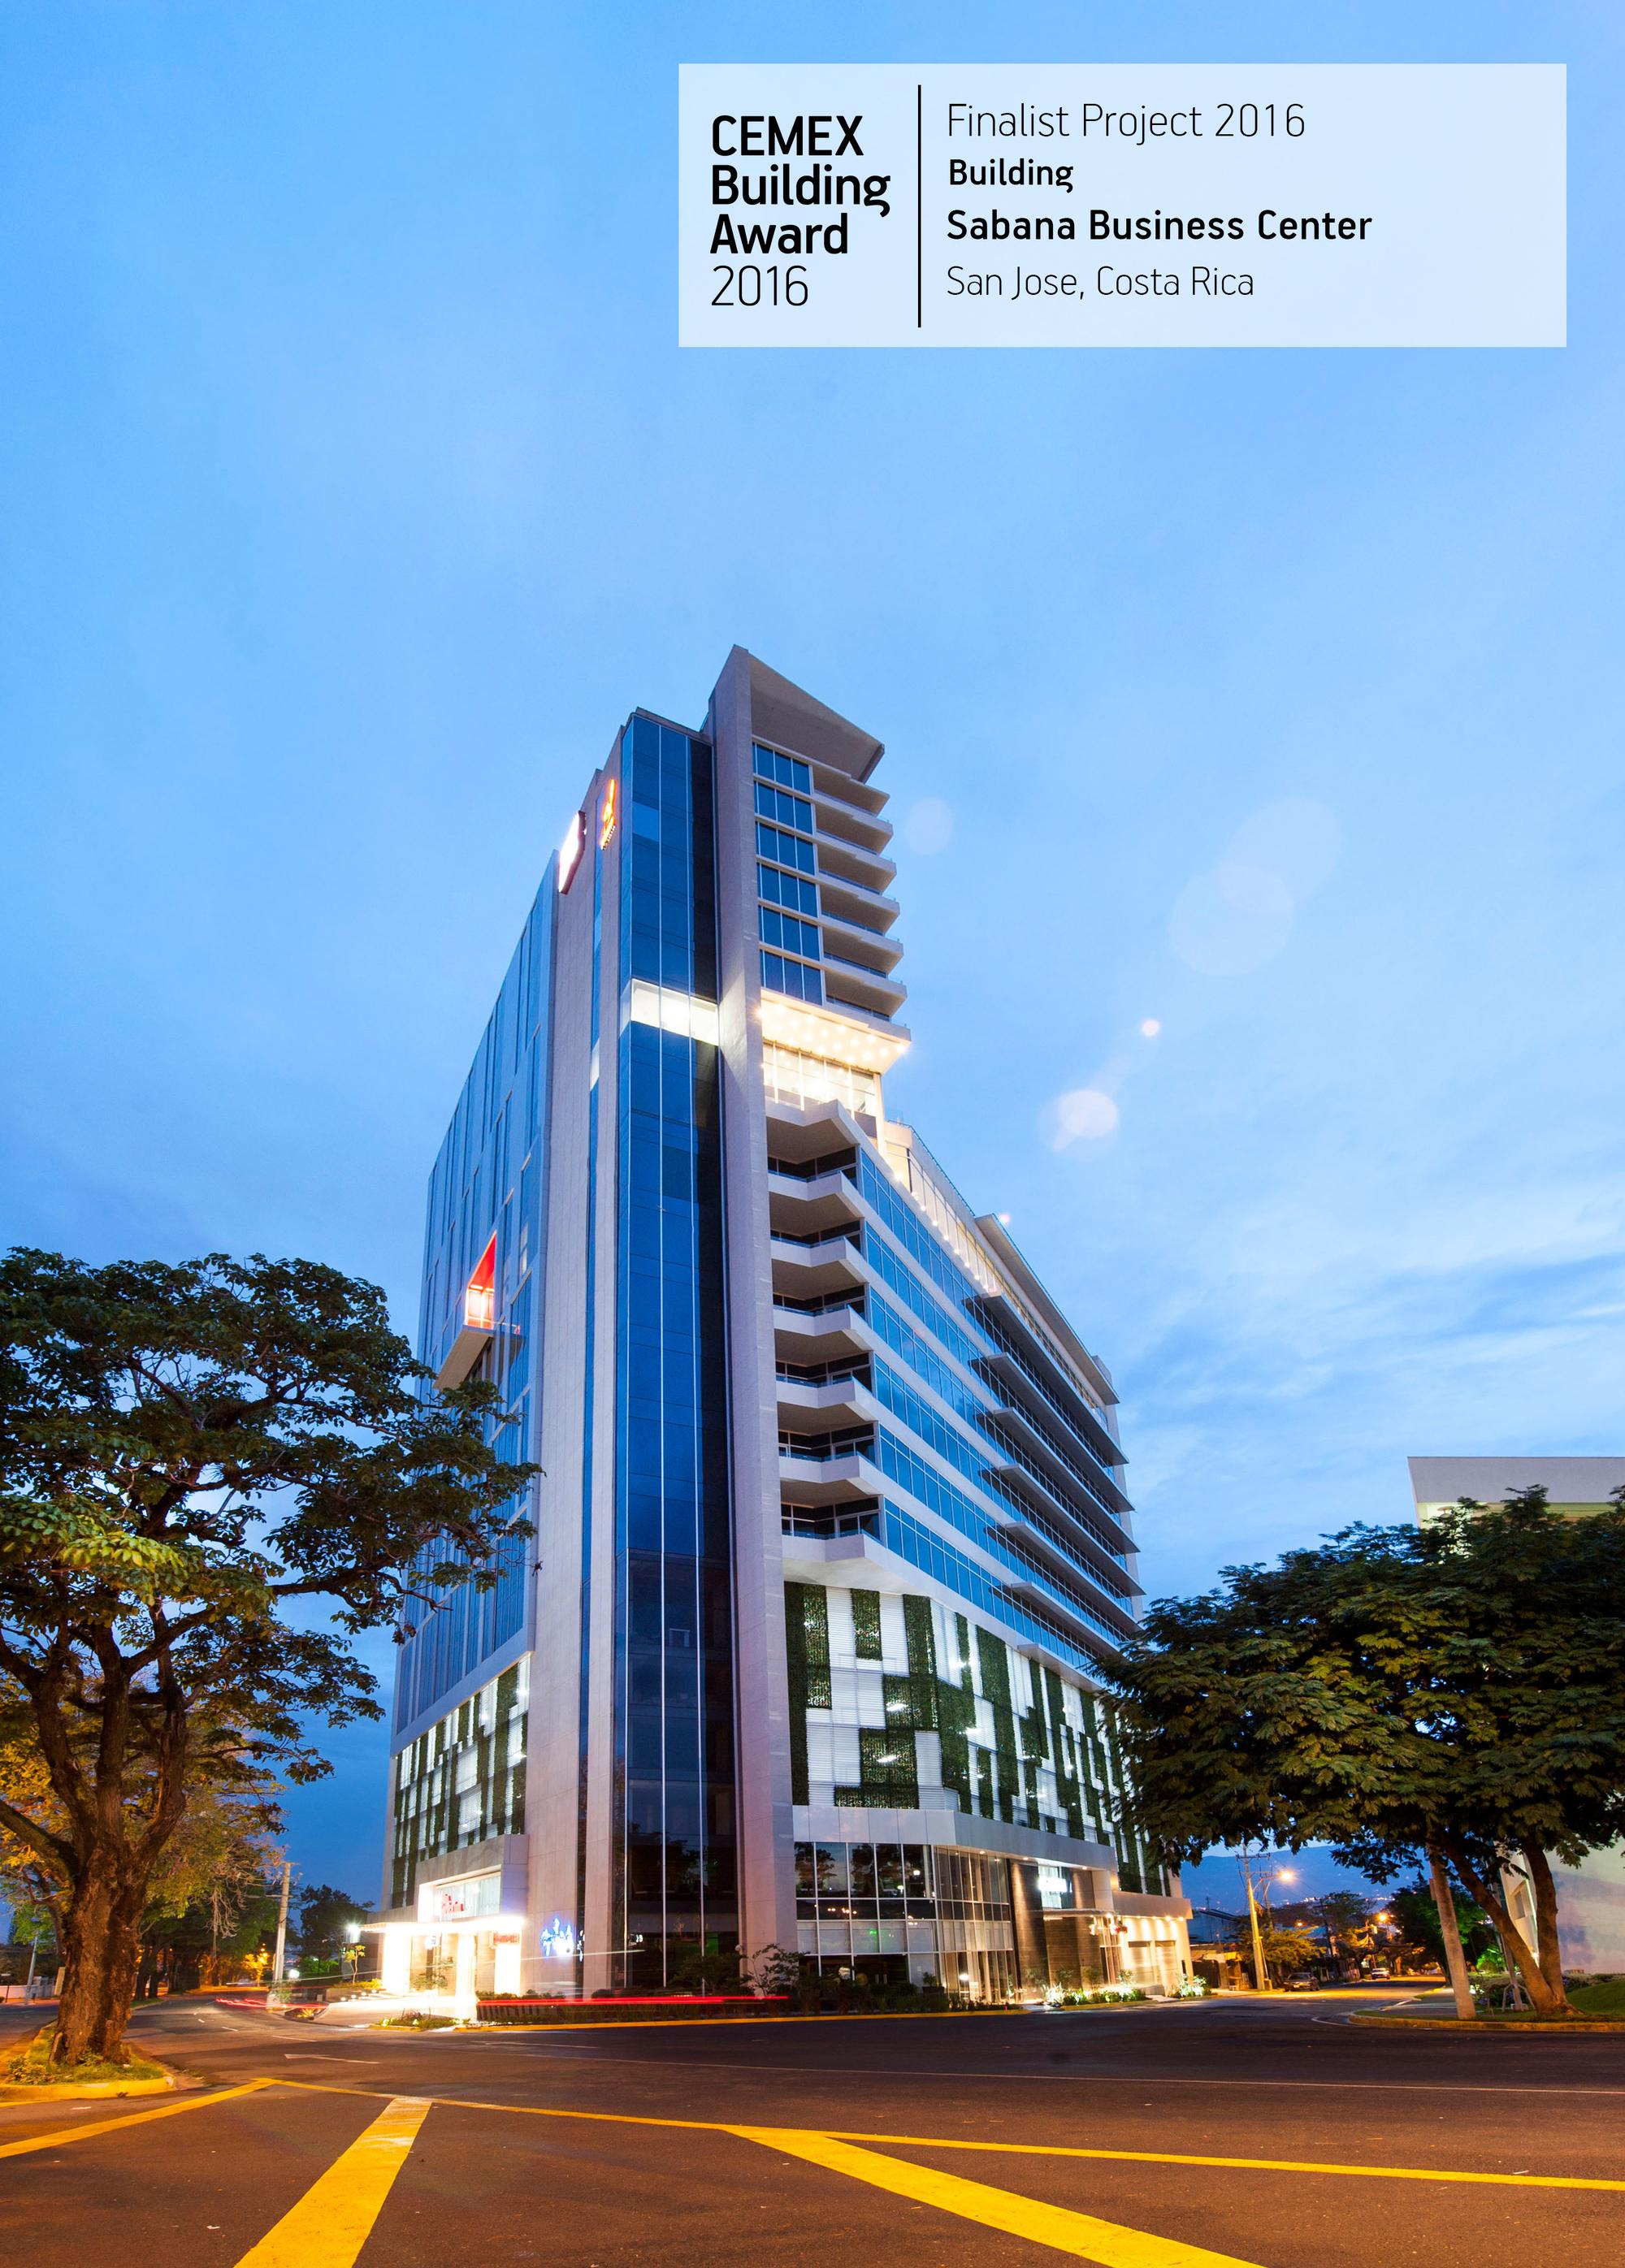 CEMEX Building Award 2016 Finalist